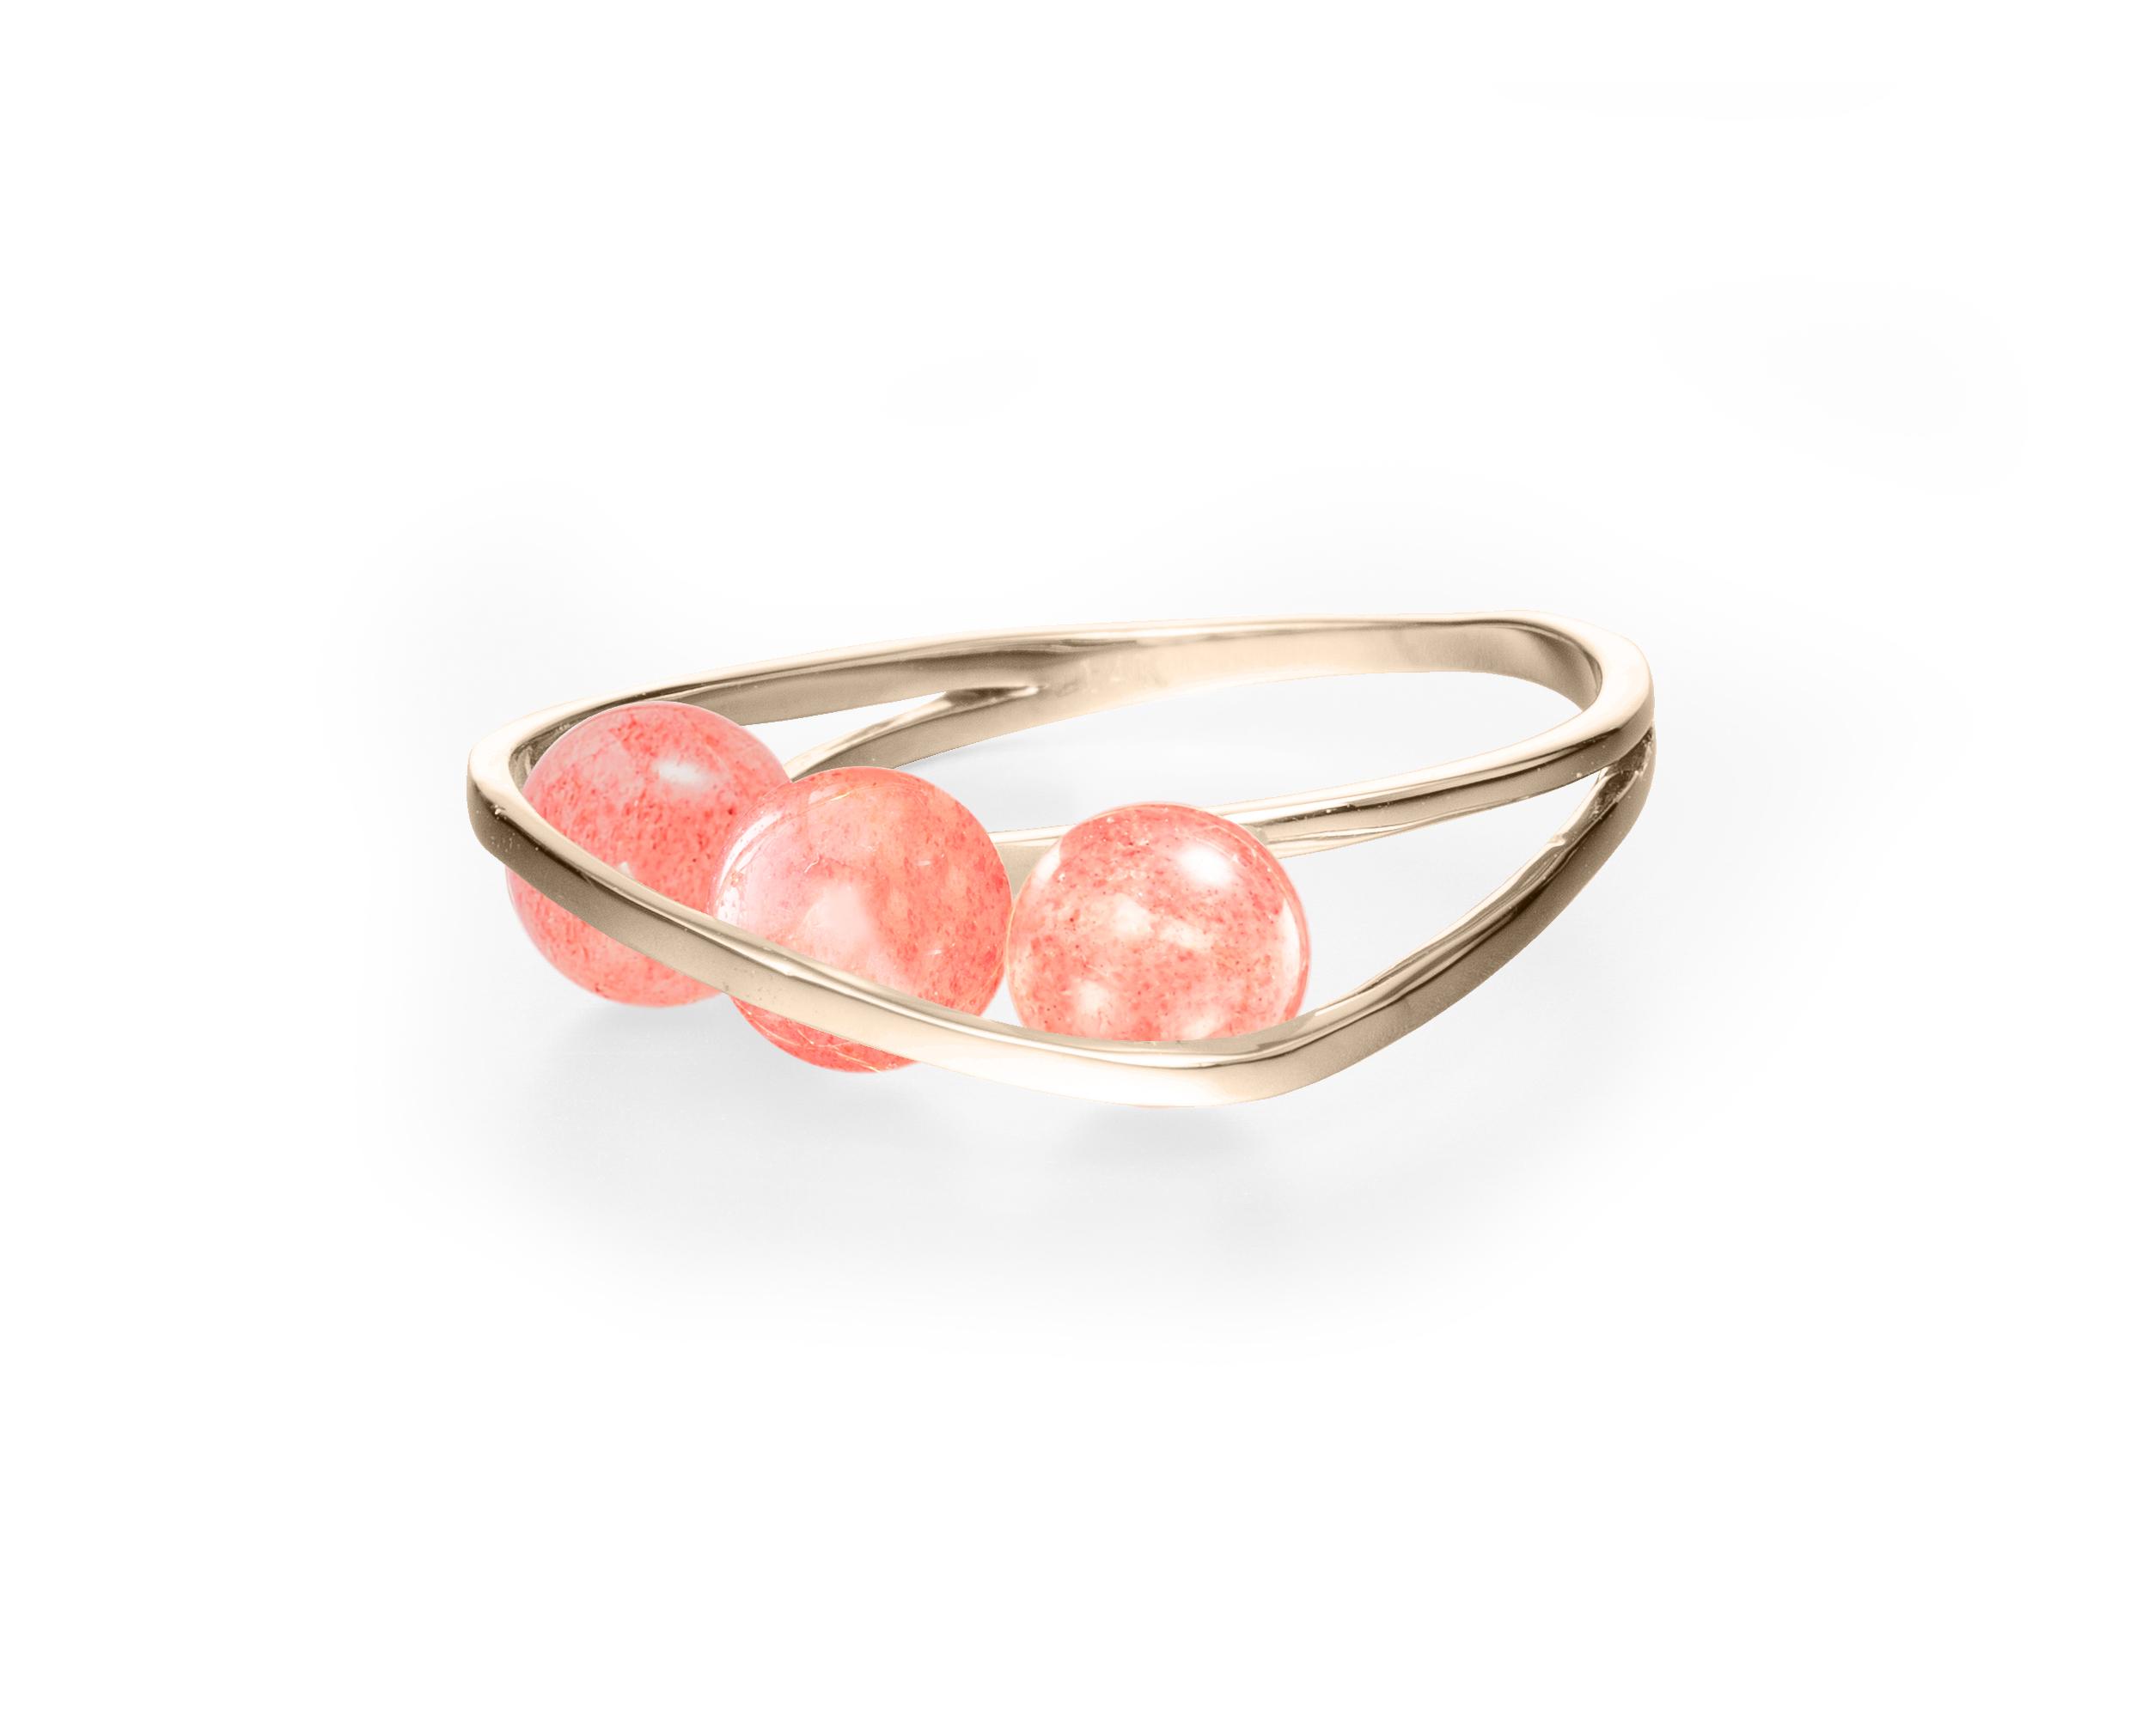 detail 2 - cherry quartz.jpg